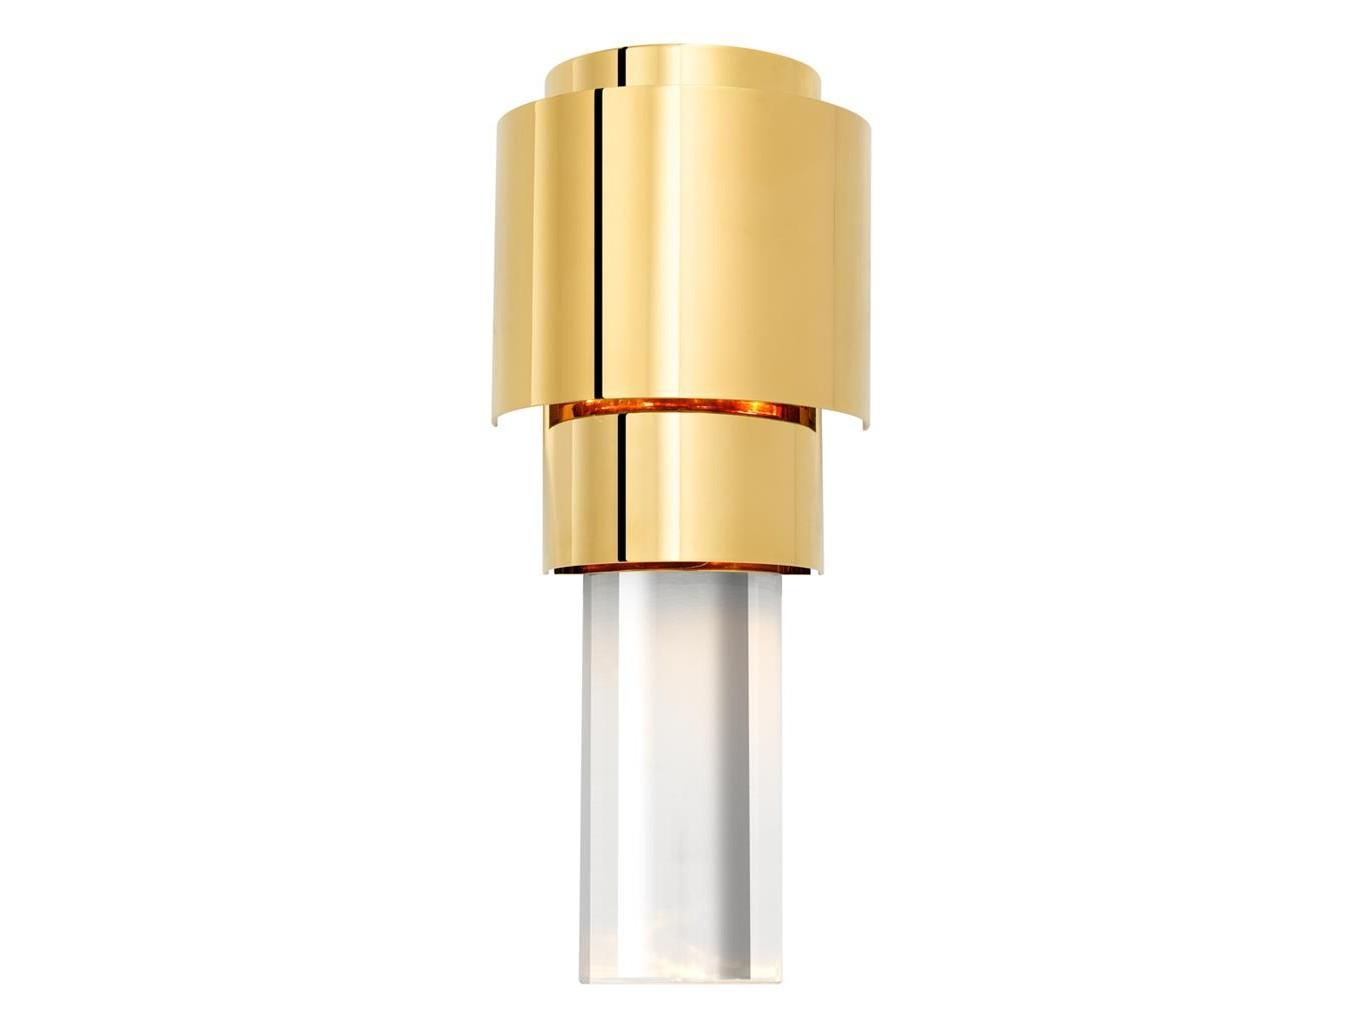 Настенный светильник AvondaleБра<br>&amp;lt;div&amp;gt;Материал: стекло, металл&amp;lt;/div&amp;gt;&amp;lt;div&amp;gt;&amp;lt;div&amp;gt;Вид цоколя: E14&amp;lt;/div&amp;gt;&amp;lt;div&amp;gt;Мощность:&amp;amp;nbsp; 40W&amp;lt;/div&amp;gt;&amp;lt;div&amp;gt;Количество ламп: 2 (нет в комплекте)&amp;lt;/div&amp;gt;&amp;lt;/div&amp;gt;<br><br>Material: Металл<br>Ширина см: 15.0<br>Высота см: 37.0<br>Глубина см: 10.0